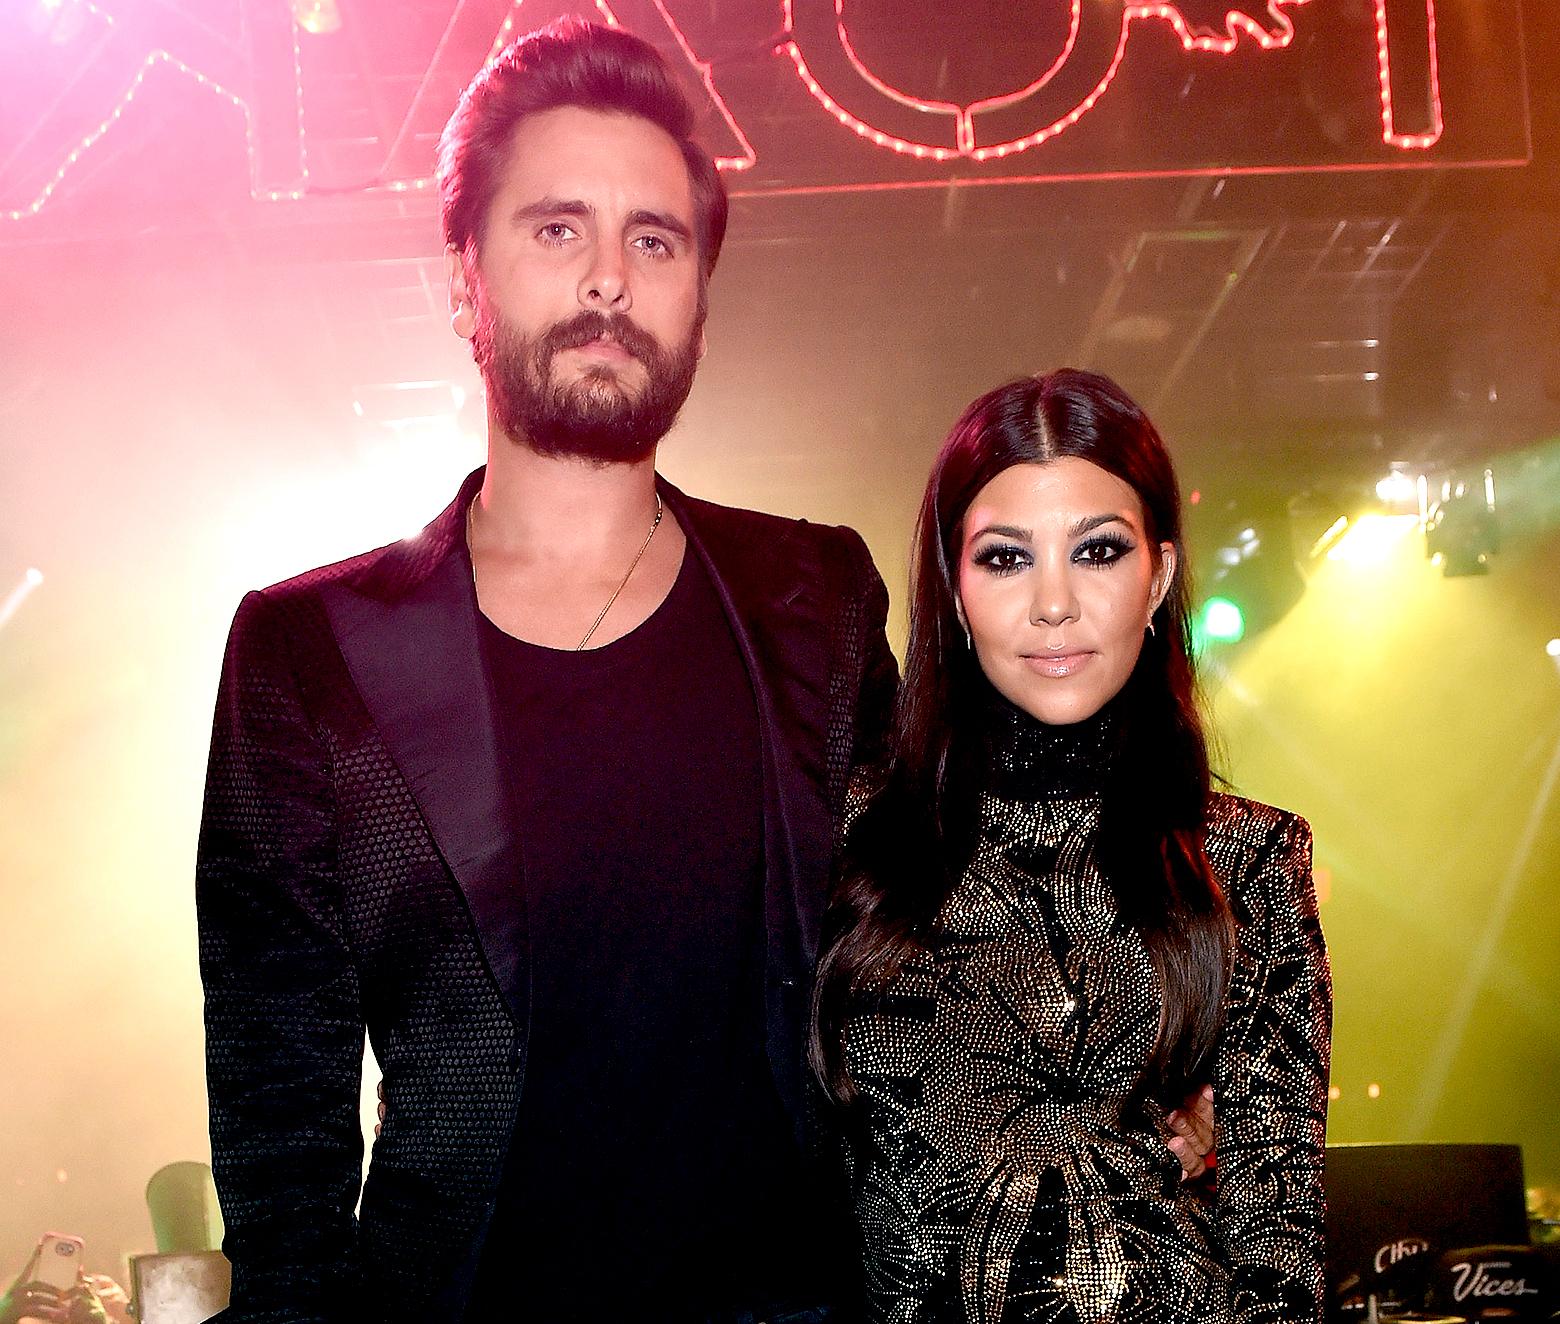 Scott Disick and Kourtney Kardashian attend his birthday celebration at 1 OAK Nightclub at The Mirage Hotel & Casino on May 23, 2015 in Las Vegas, Nevada.